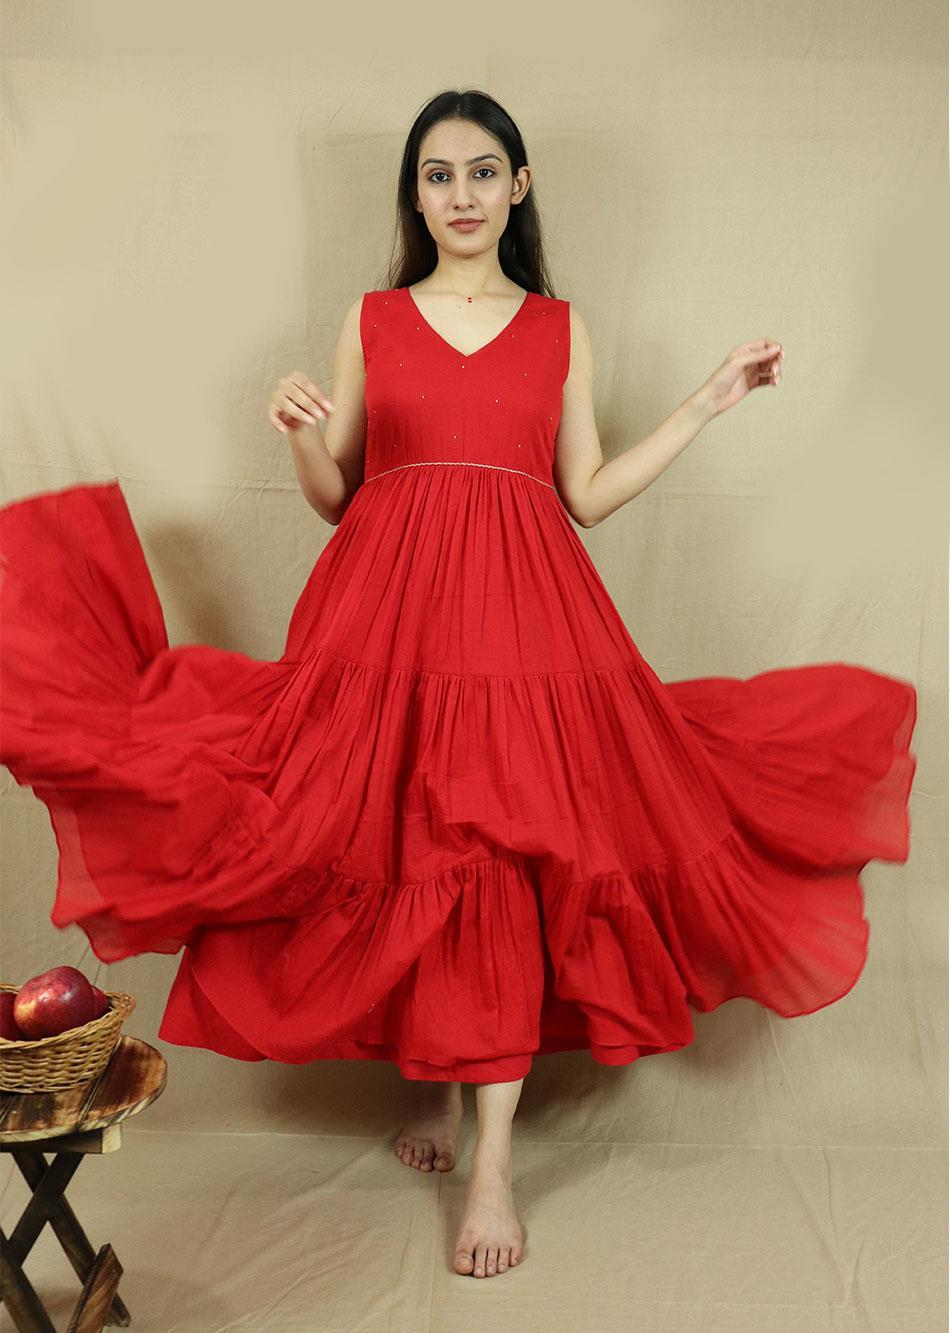 THE UMAIRA DRESS  By Jovi Fashion